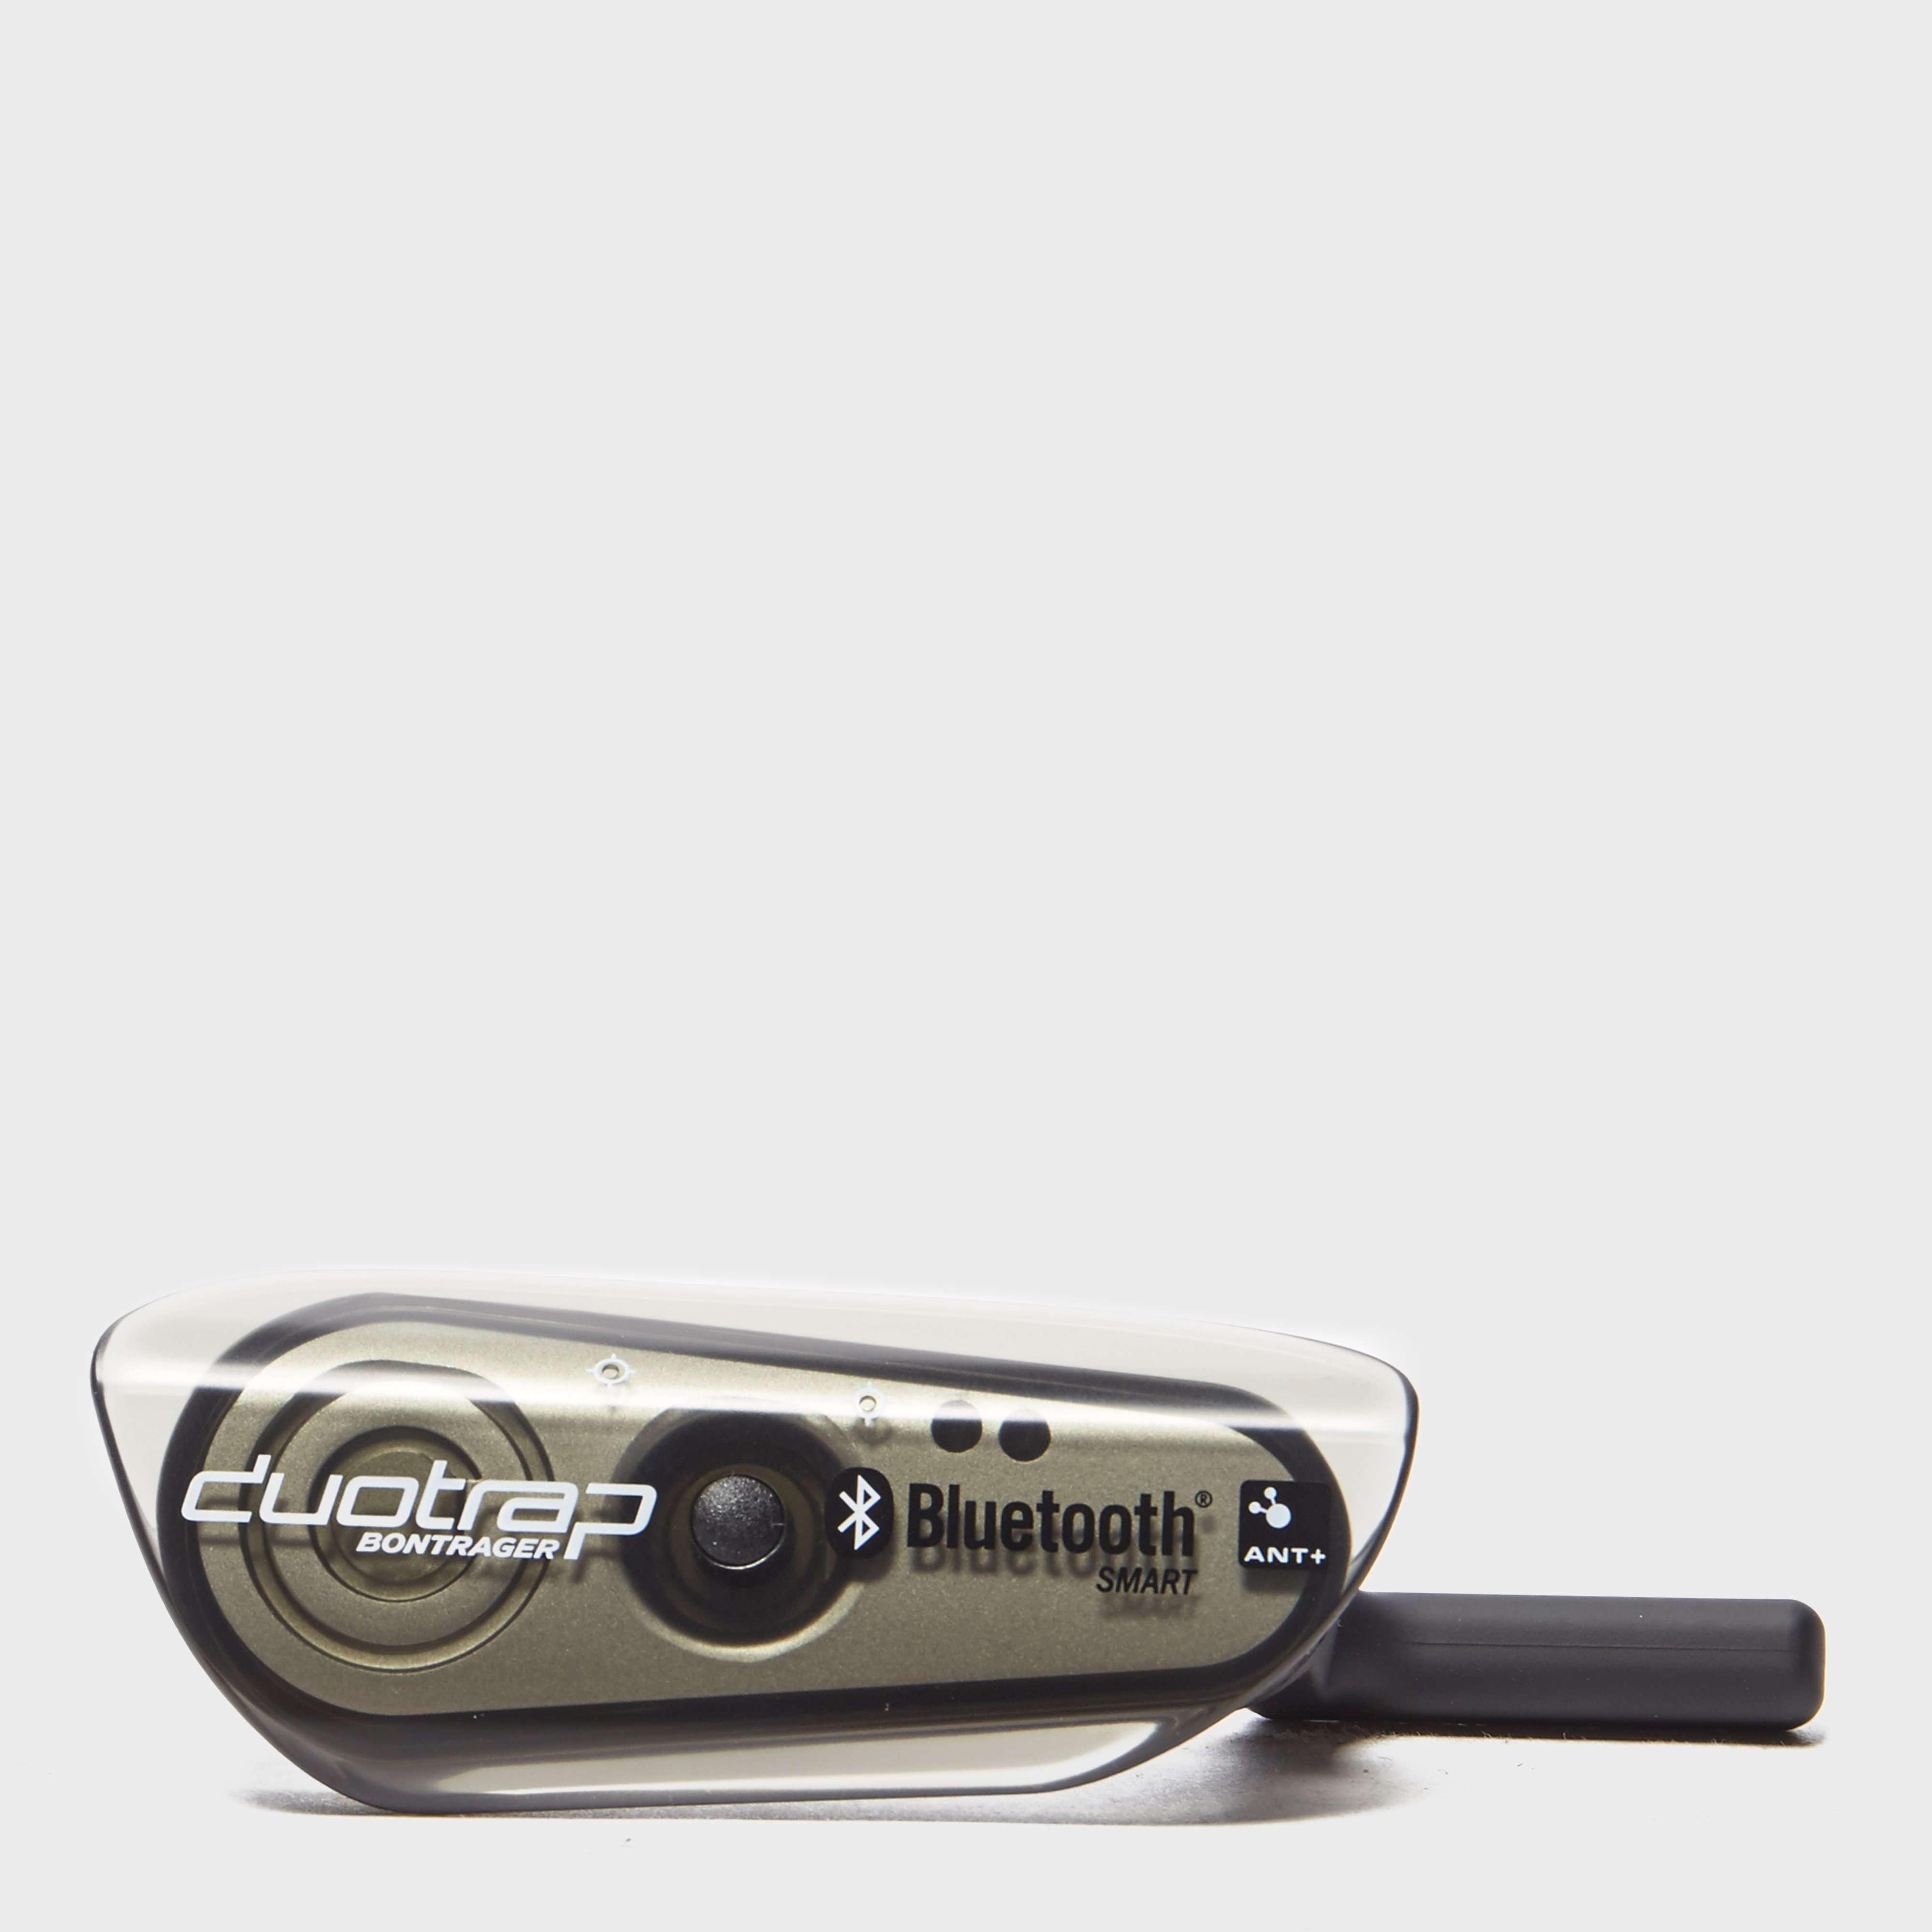 BONTRAGER DuoTrap Digital Speed/Cadence Sensor